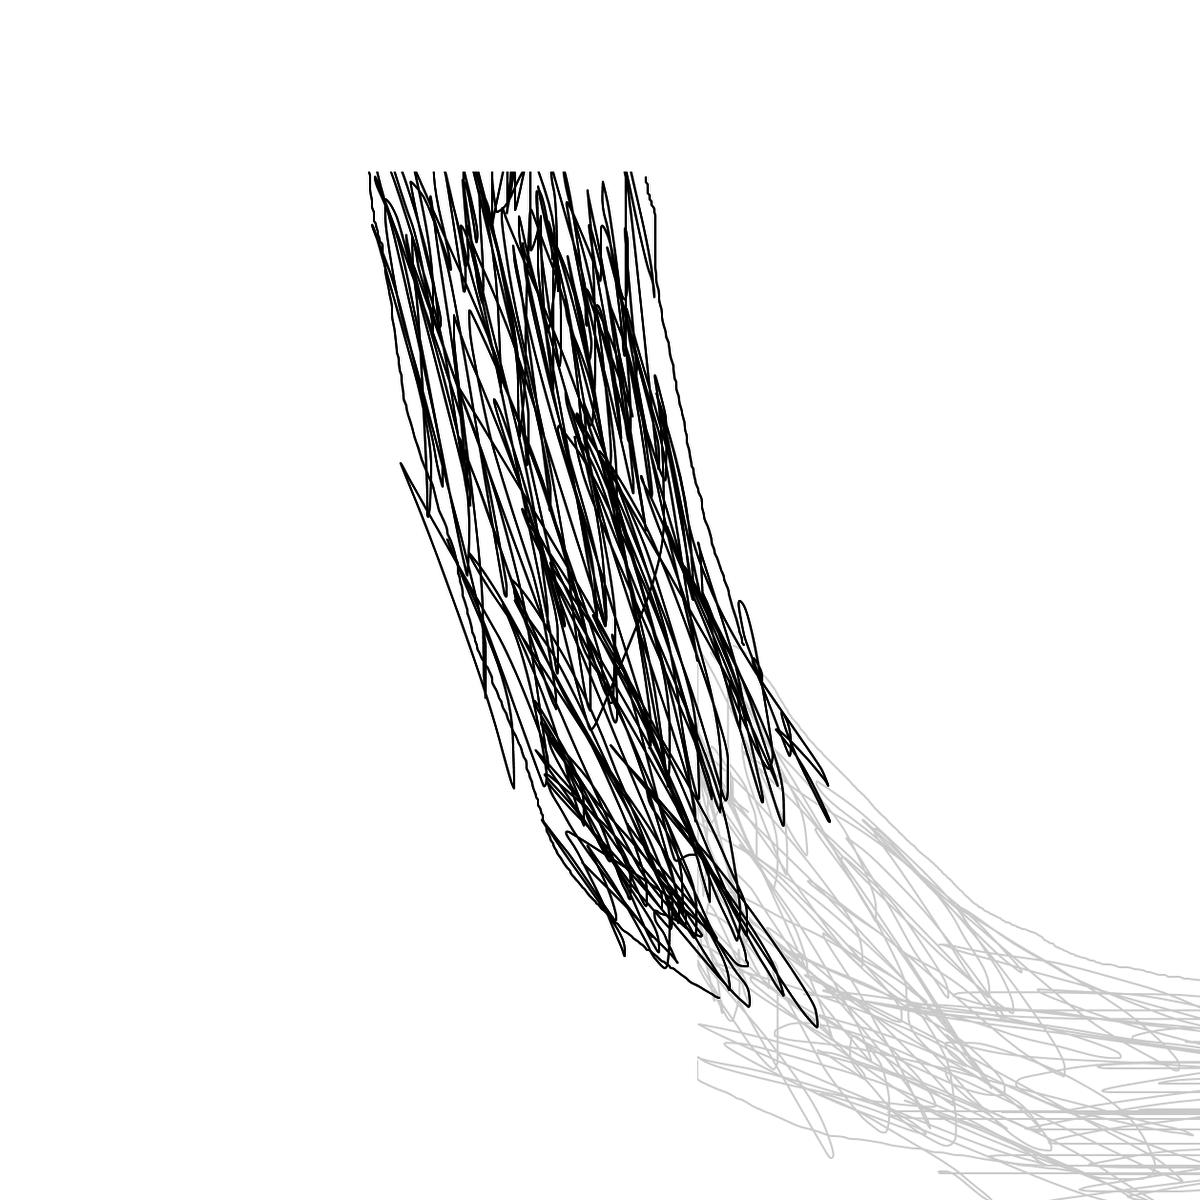 BAAAM drawing#11422 lat:52.4758644104003900lng: 13.4056653976440430